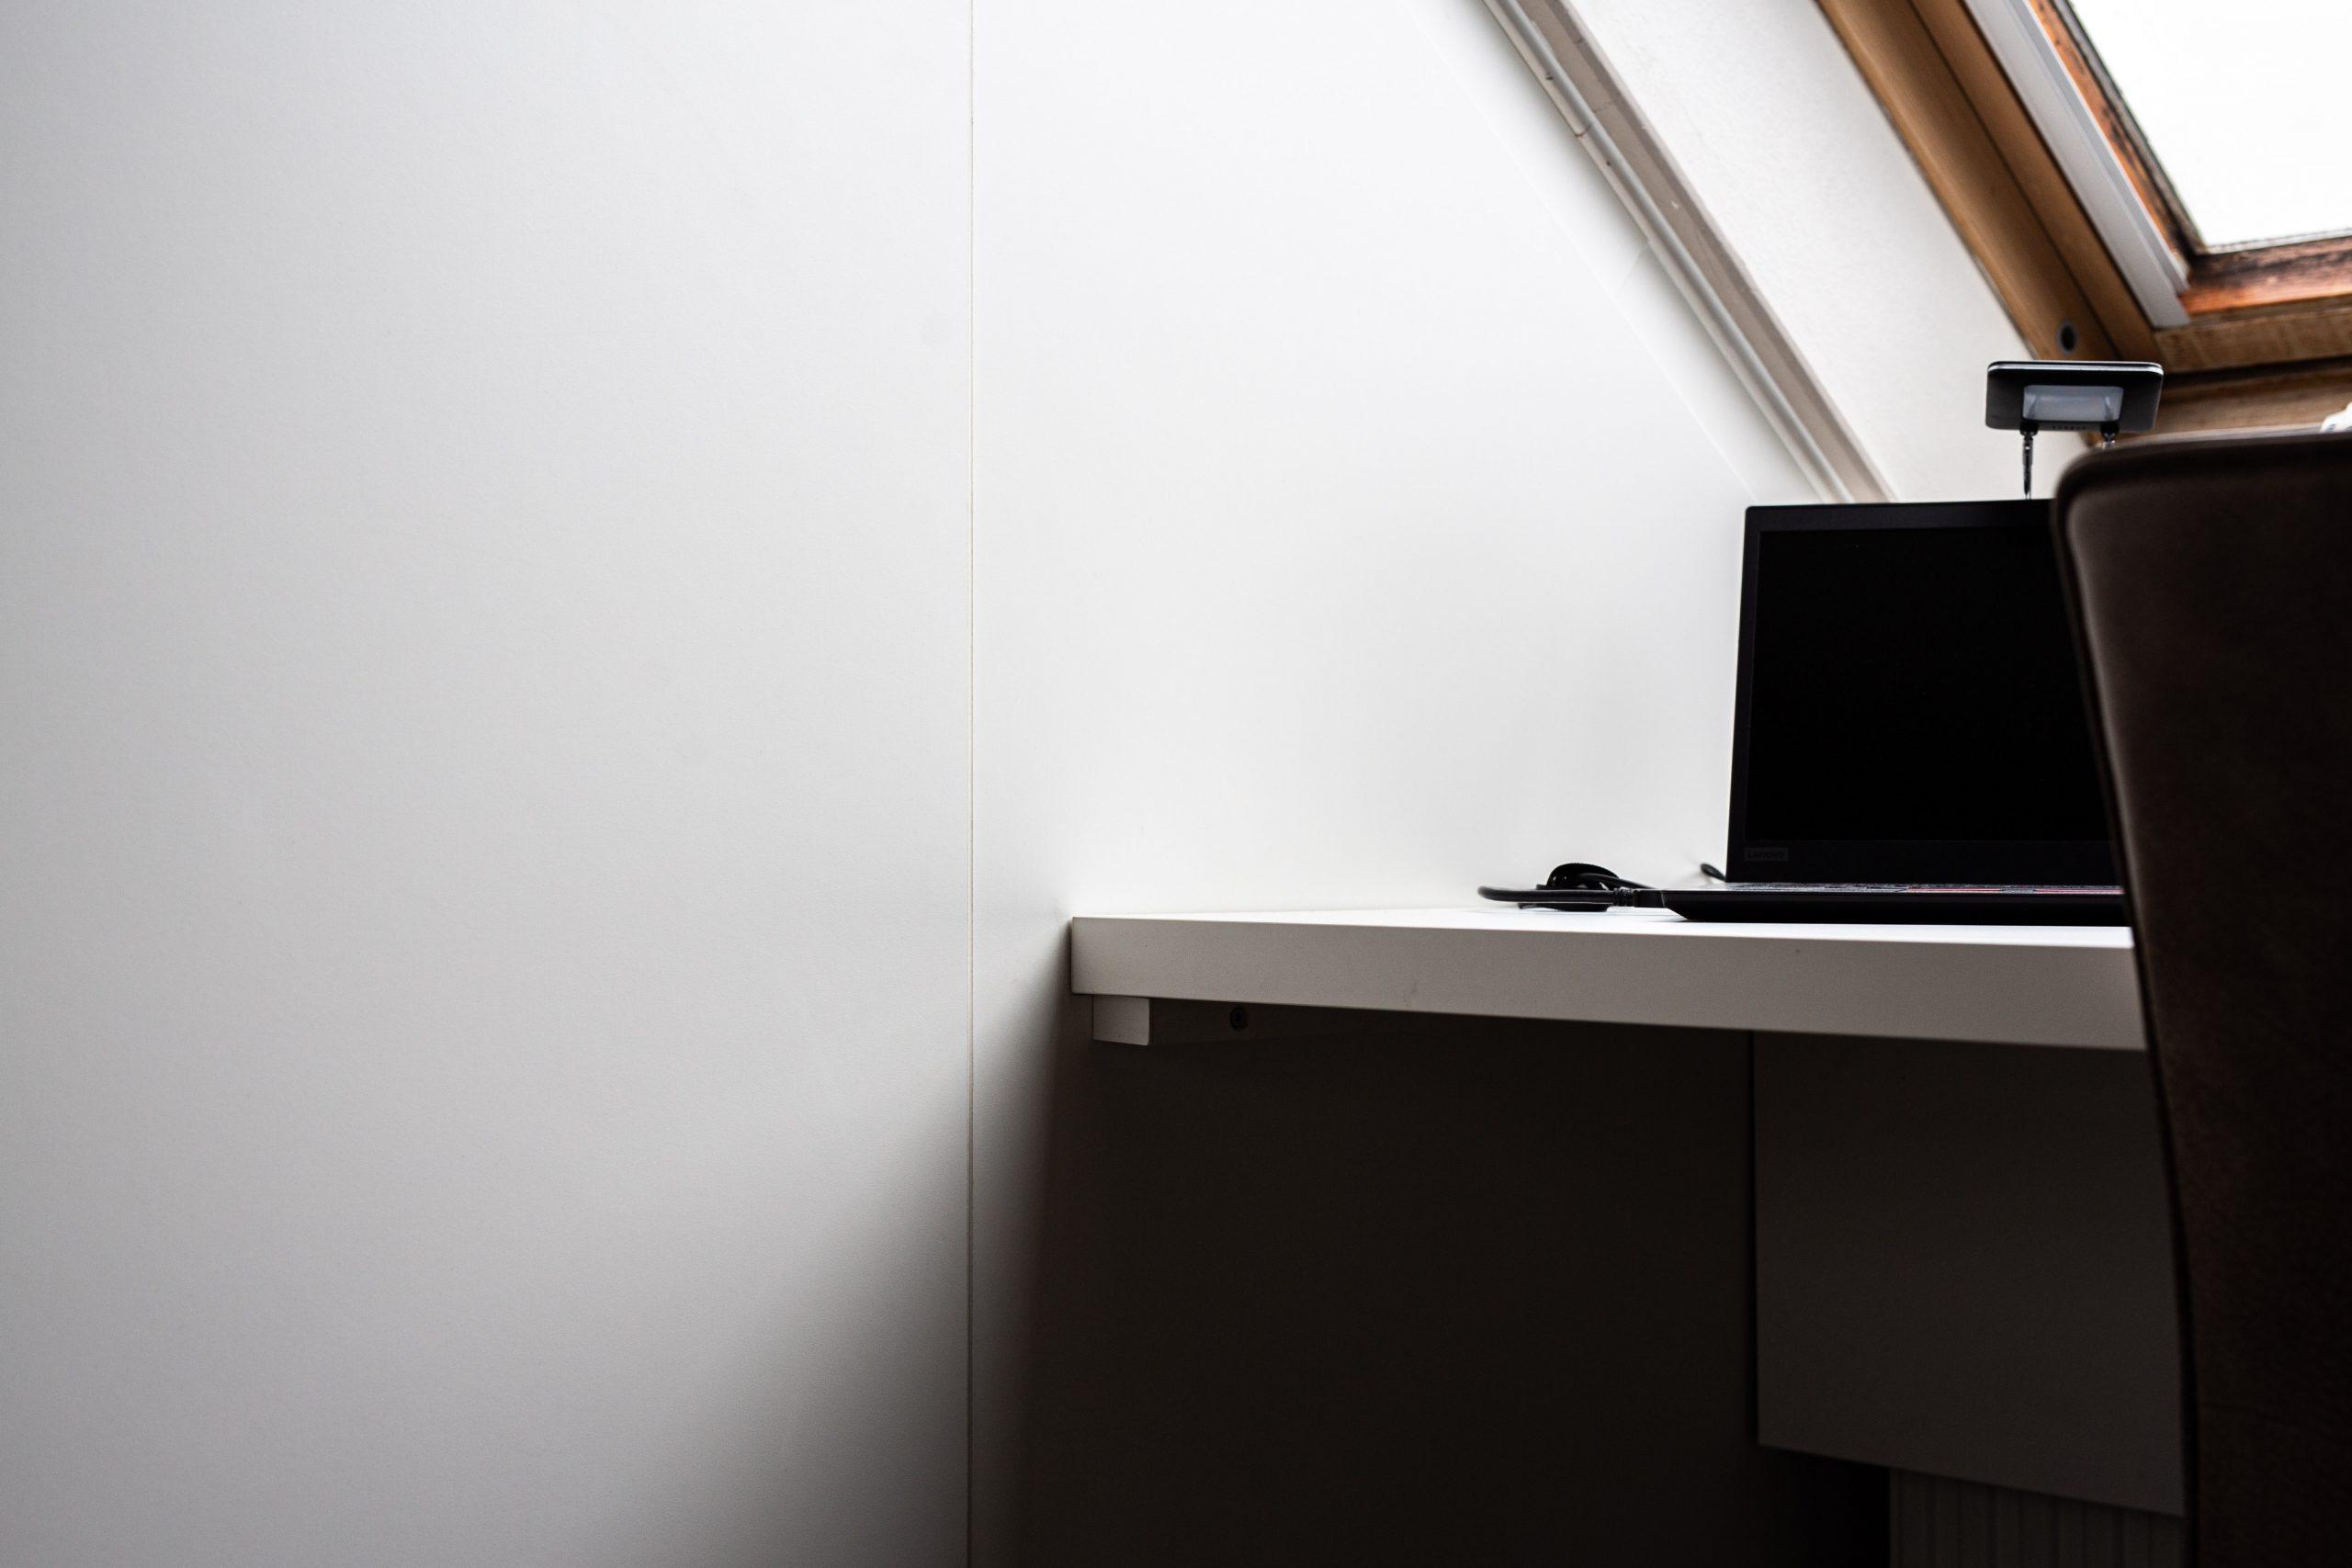 Sens Interieurs - thuiswerkplek op zolder - galerij5